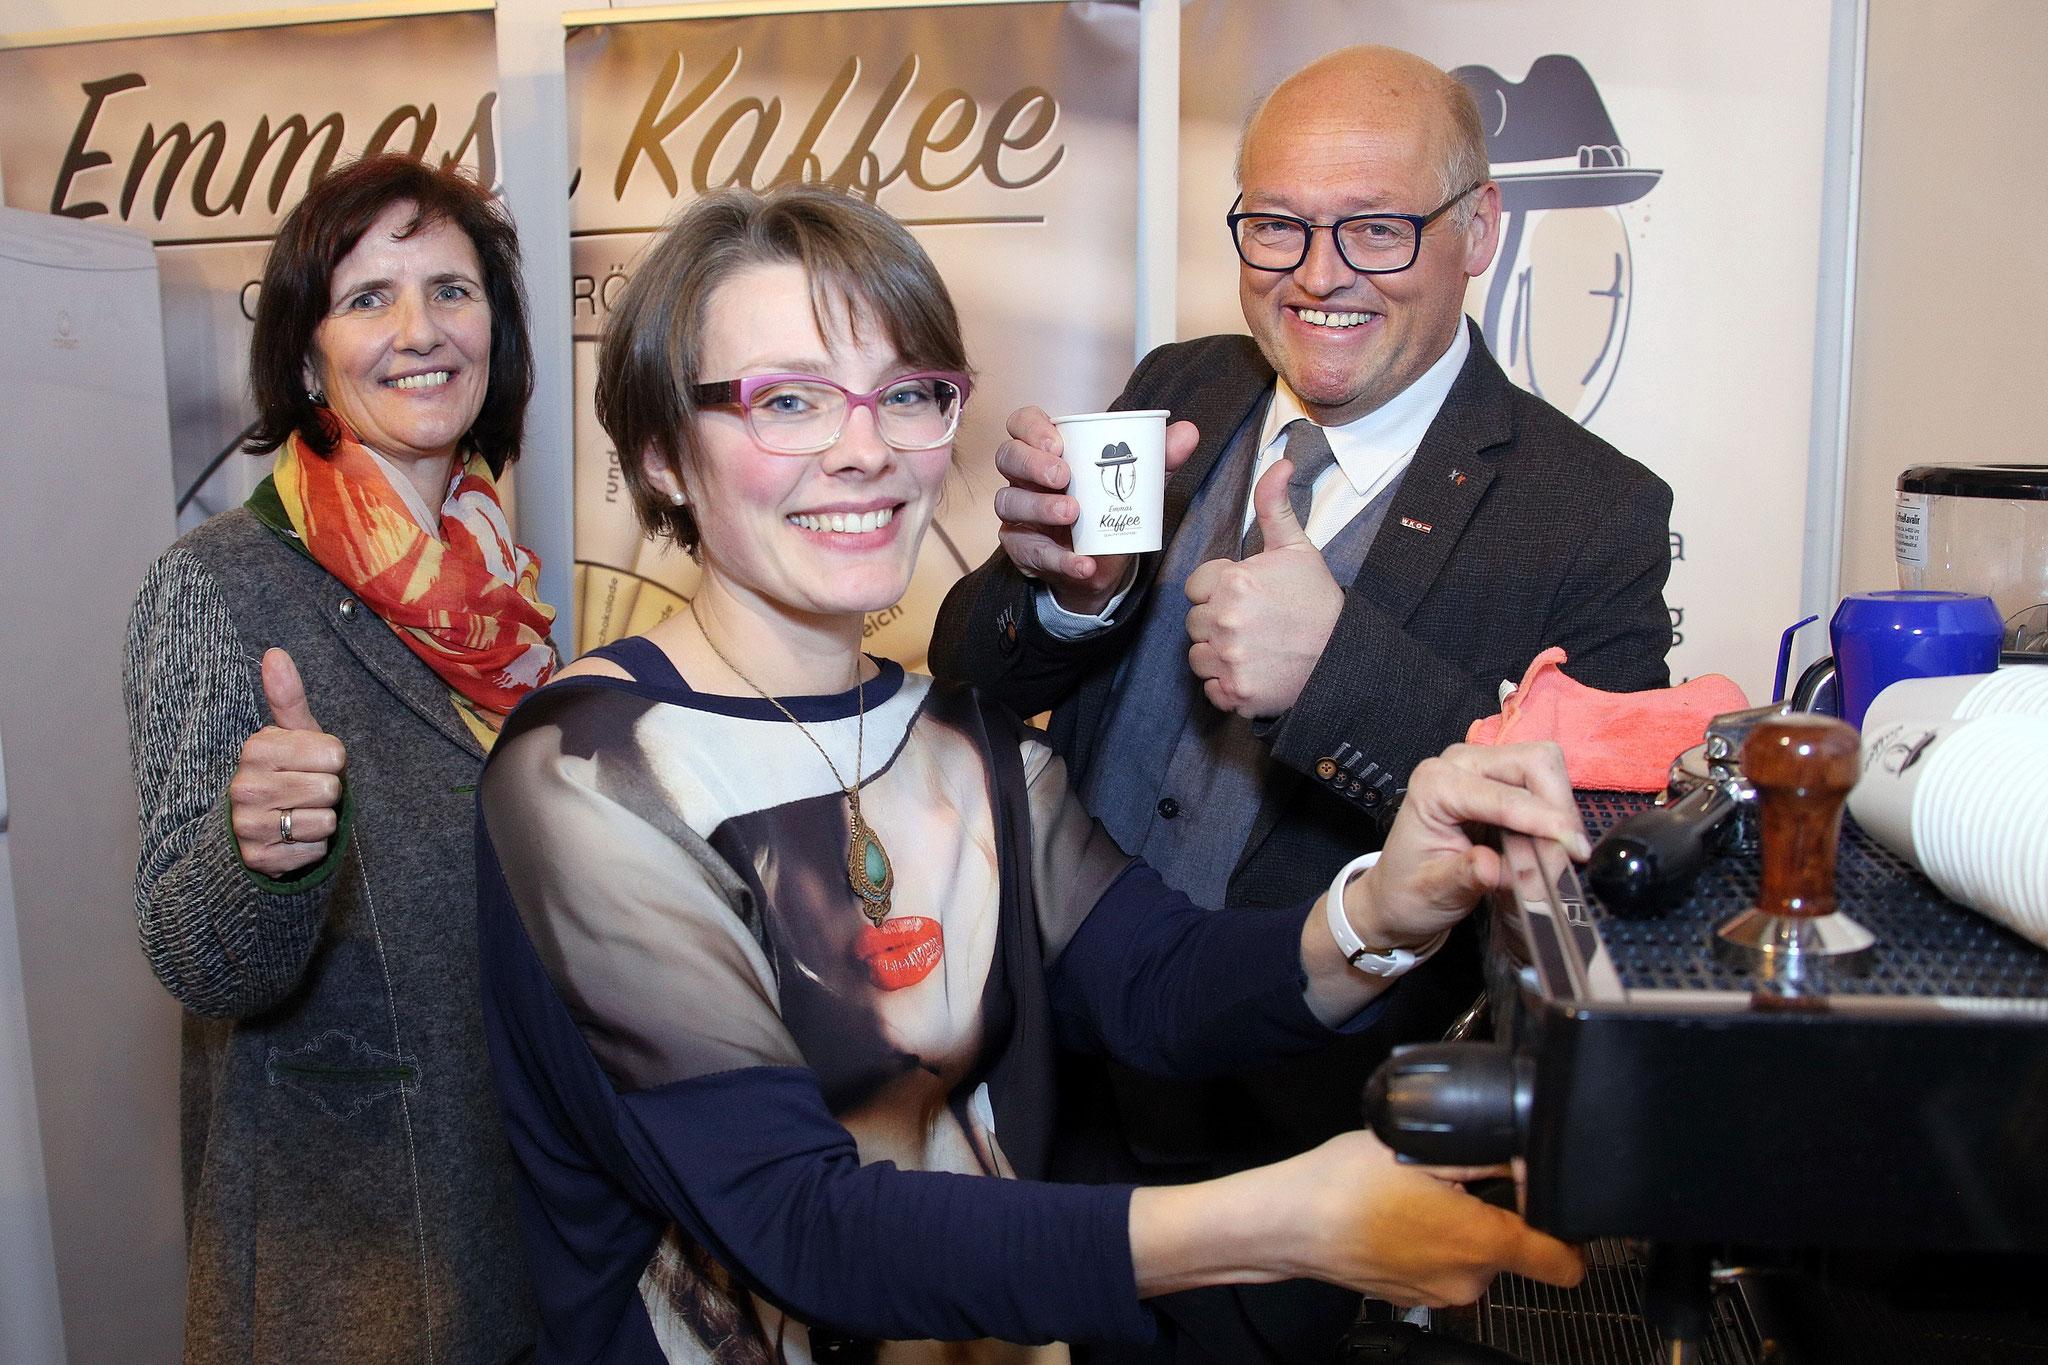 Kaffee-Genuss am Emmas Kaffee Stand